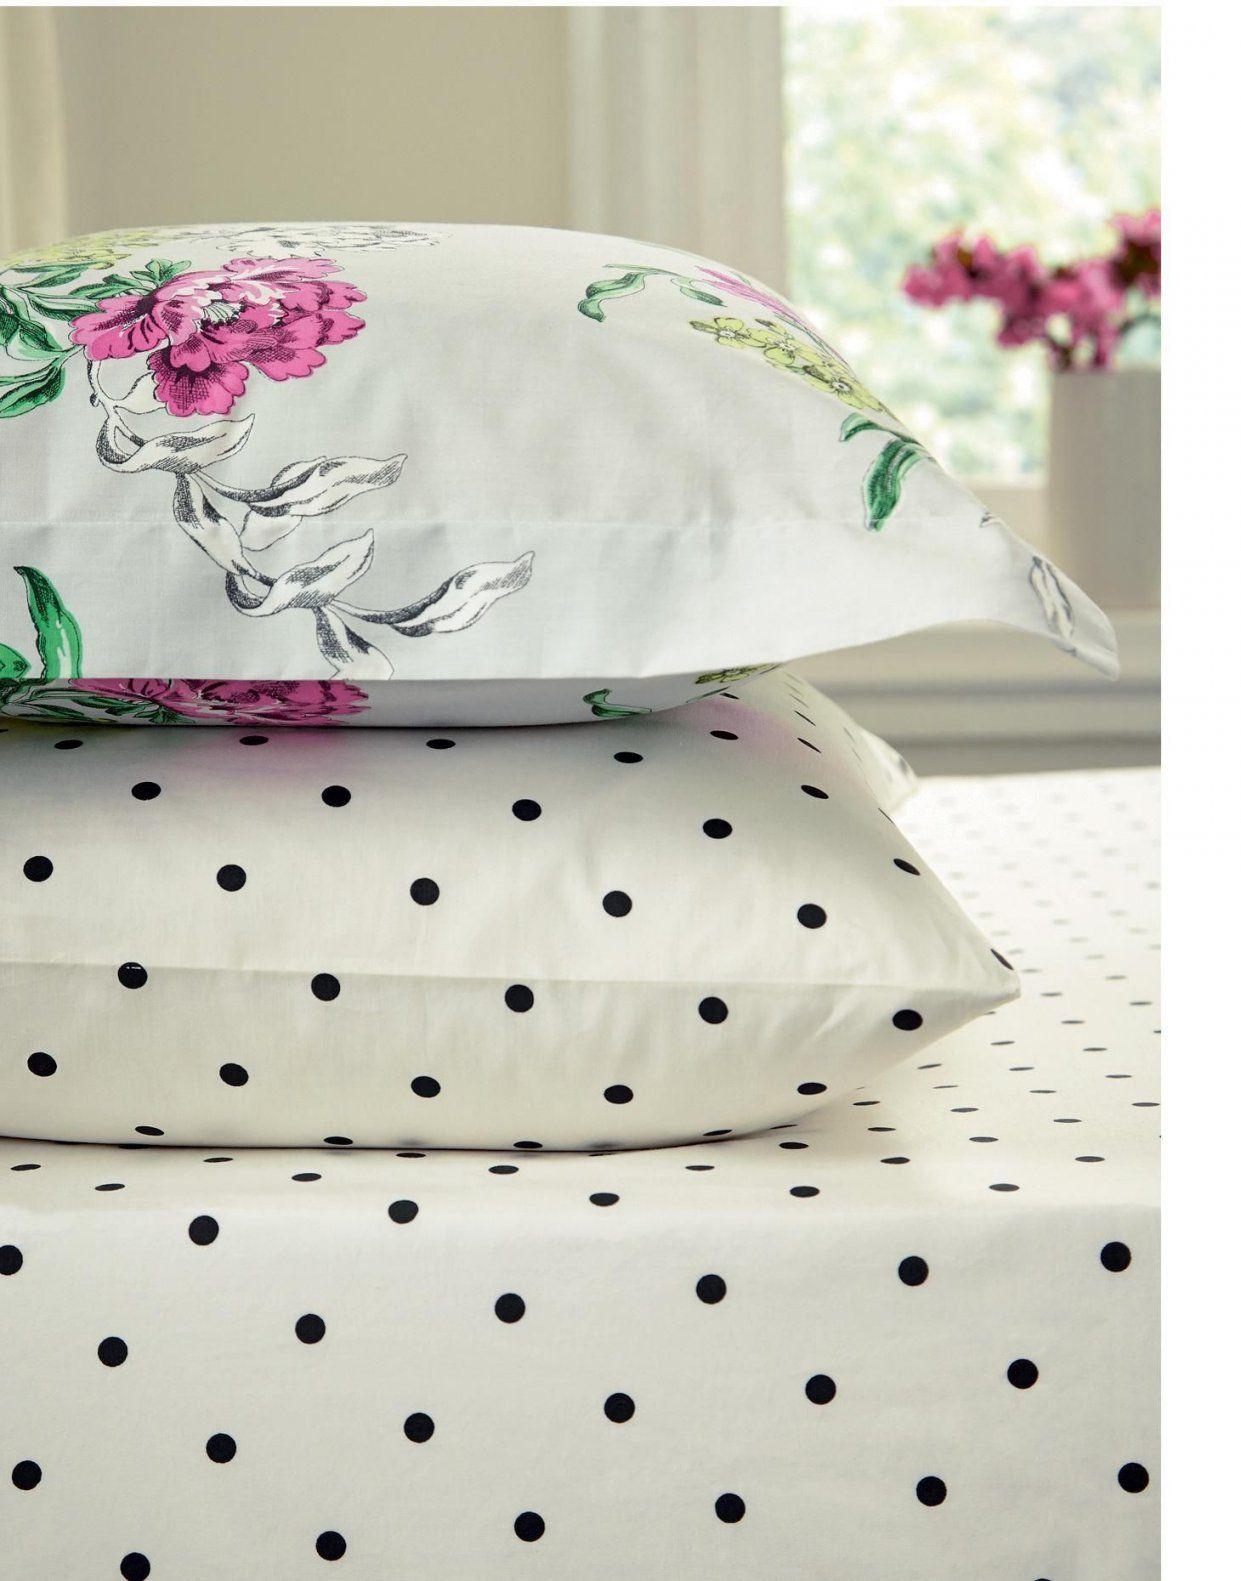 Sheetgreyspot Grey Spot Grey Polka Dot Fitted Sheet  Joules Uk von Polka Dotted Bed Sheets Bild